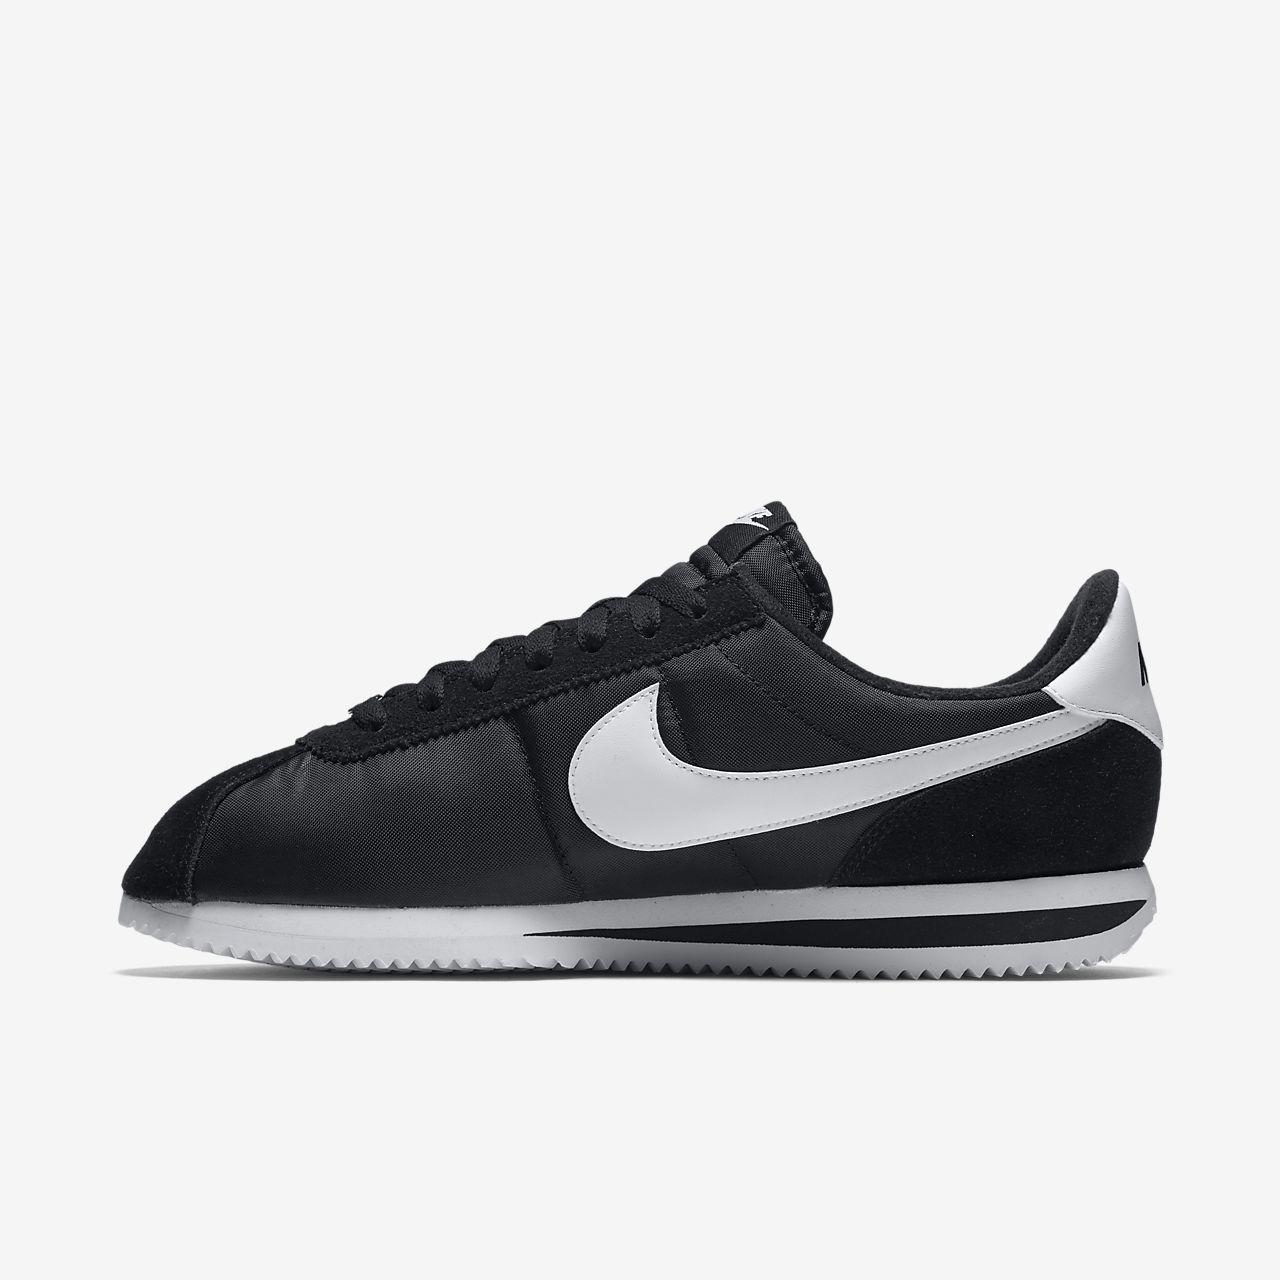 Chaussure Nike Cortez Basic Nylon pour Homme